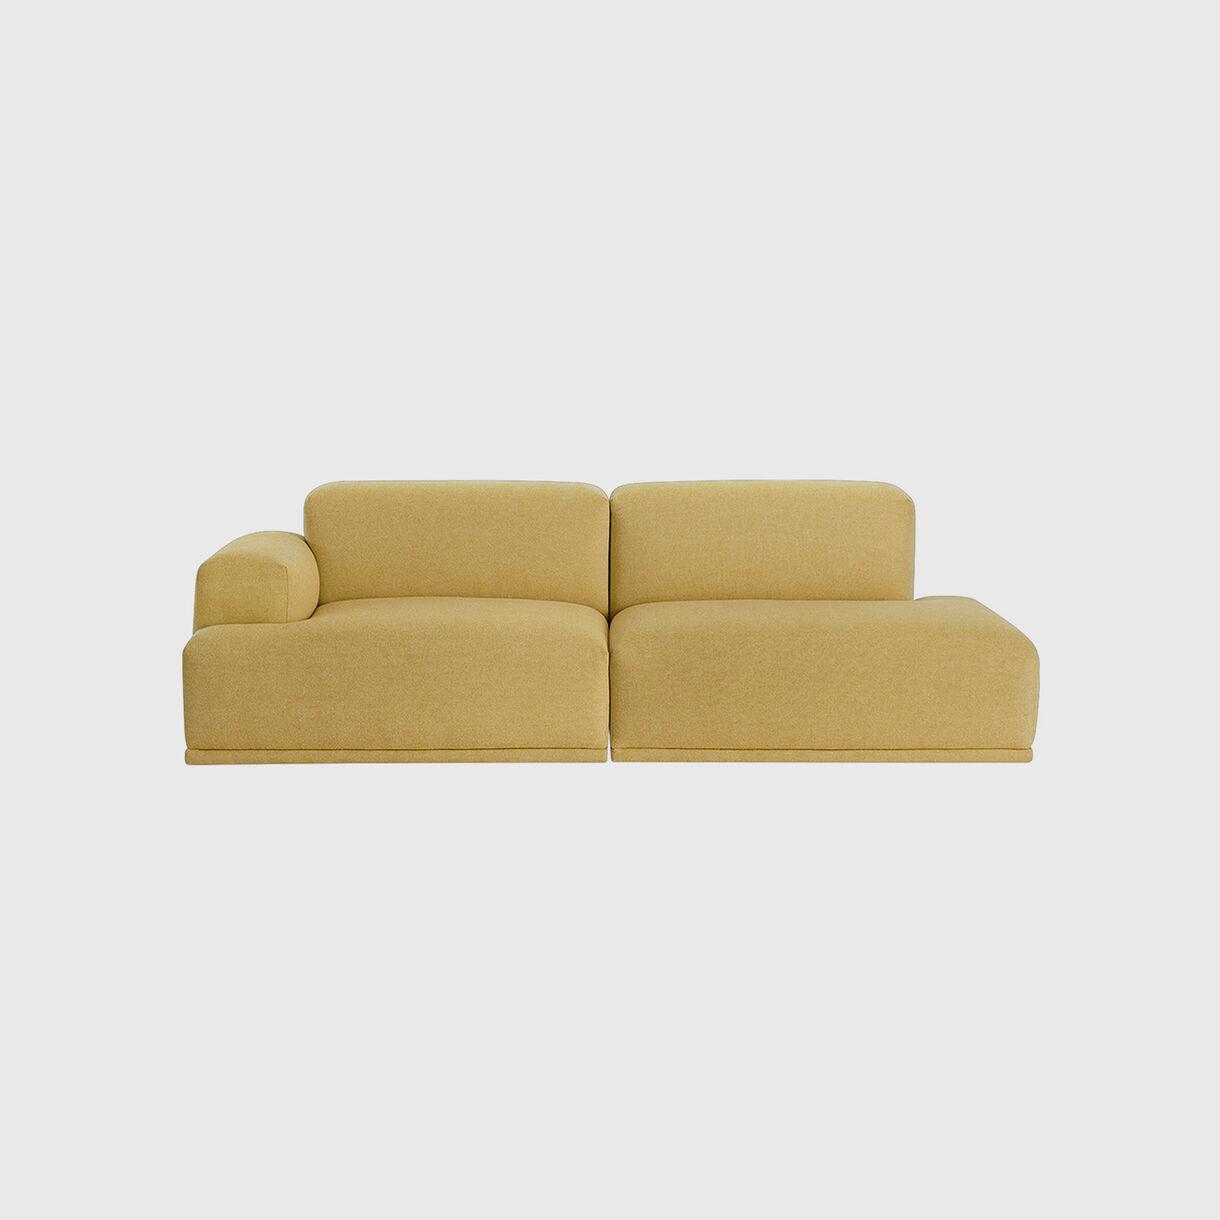 Connect Sofa, 2 Seater, Hallingdal 407